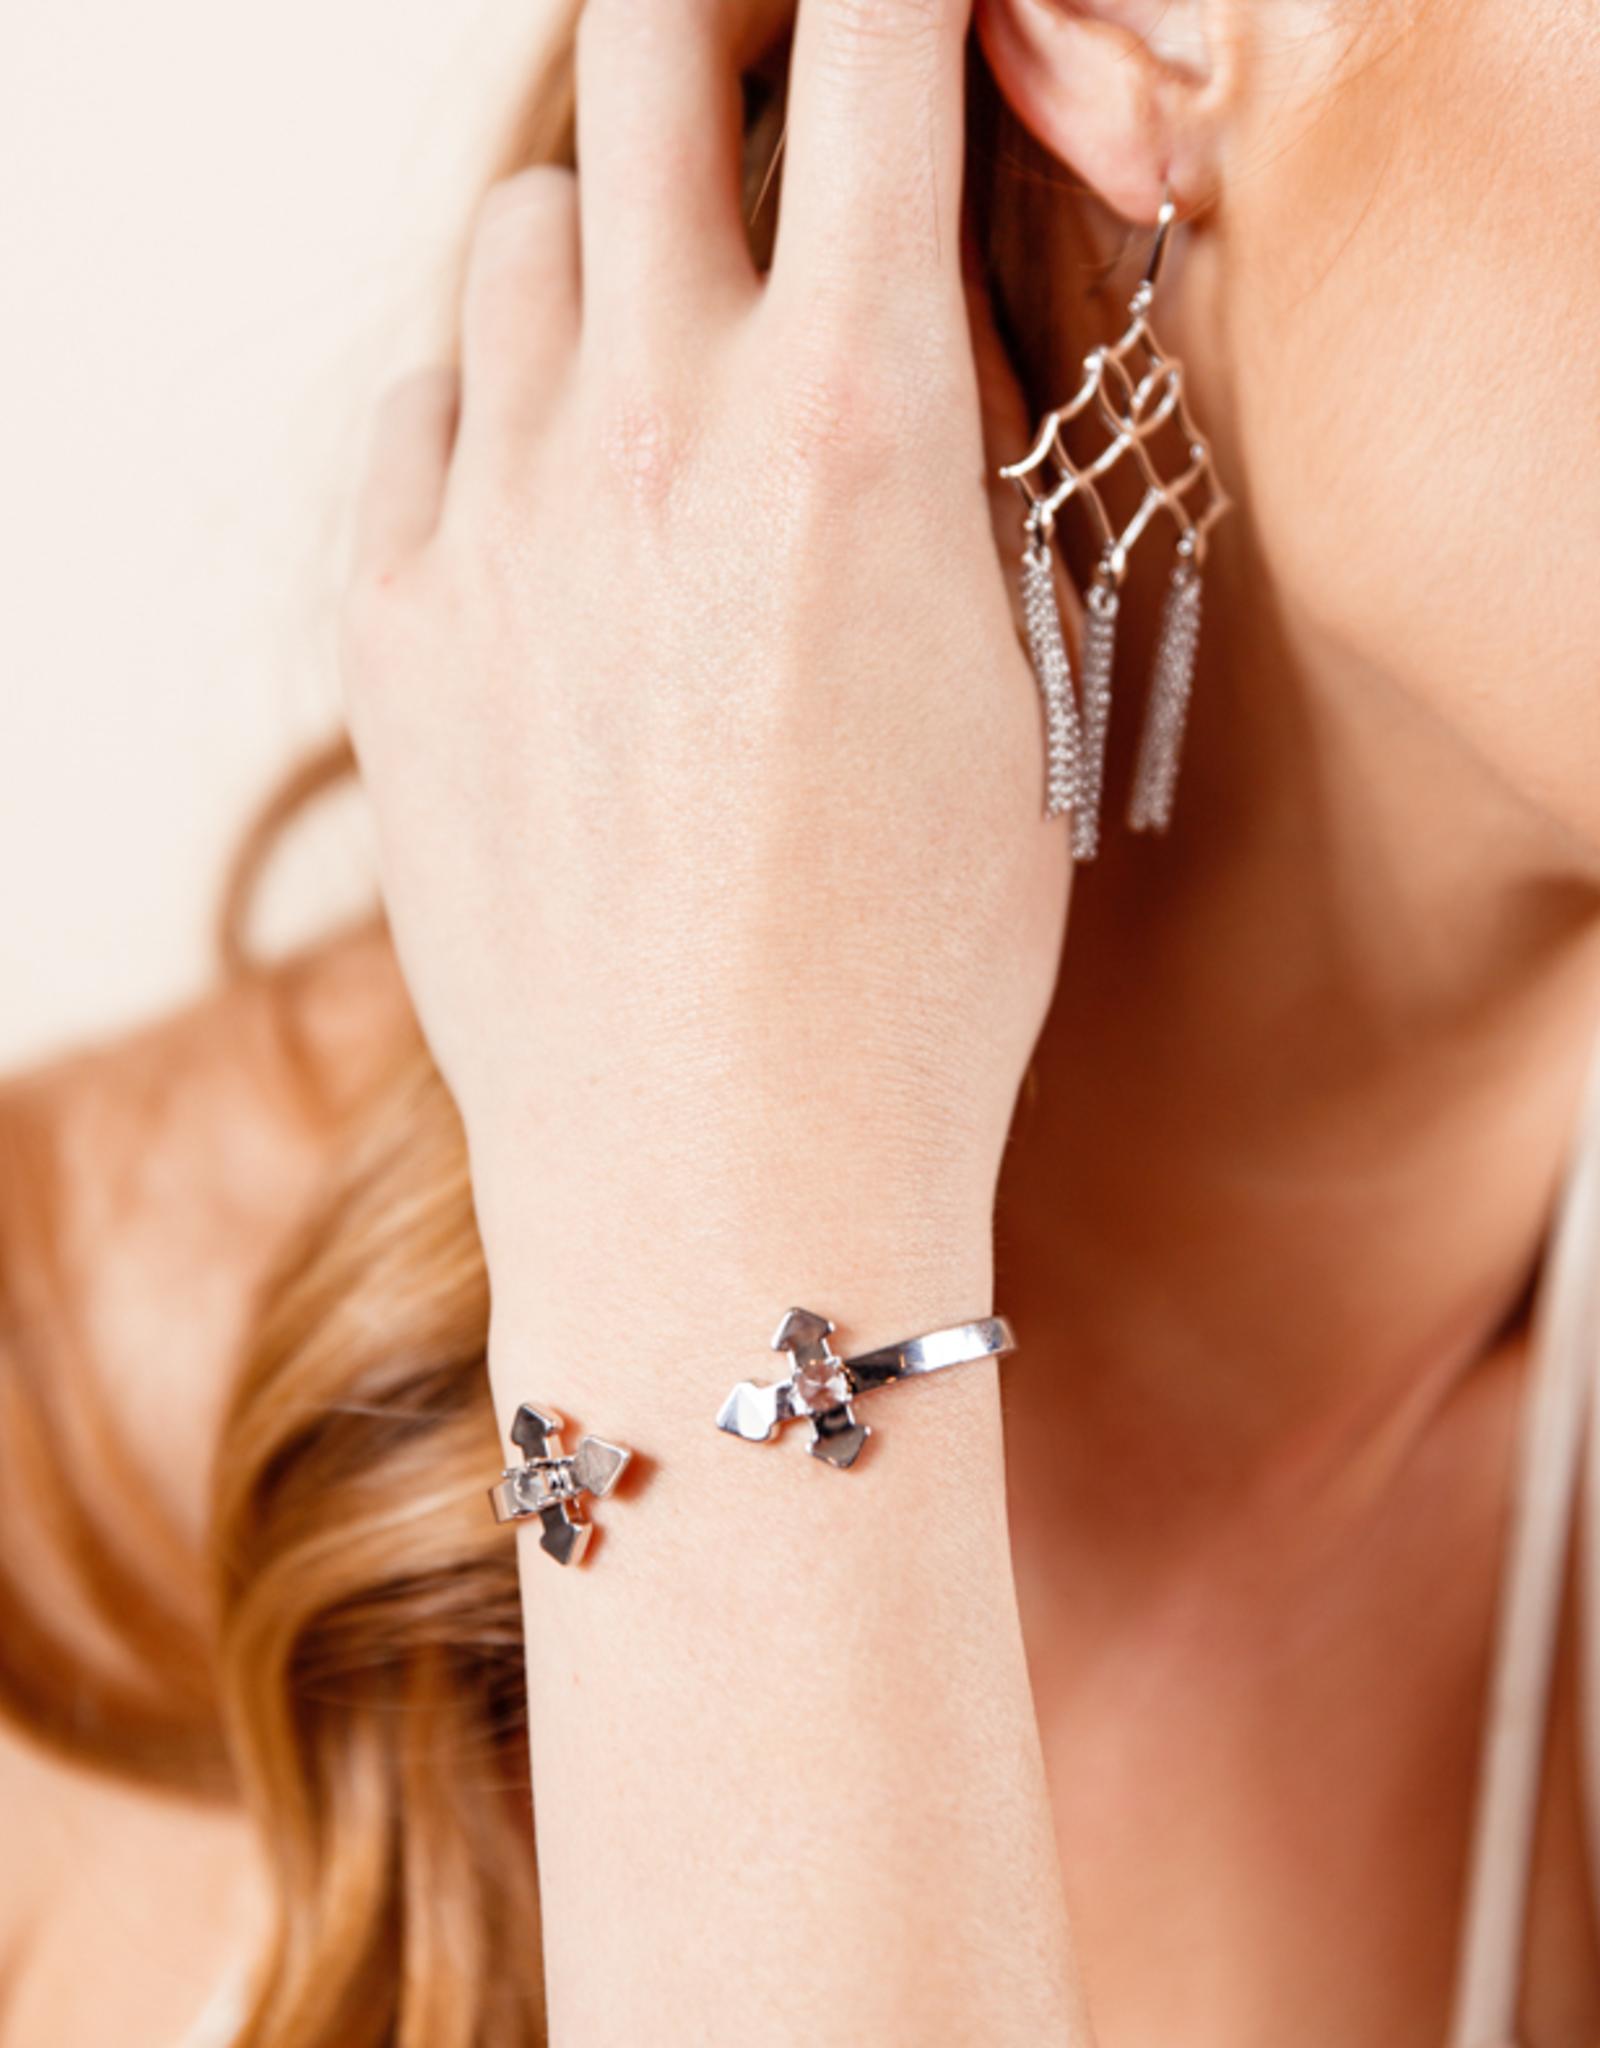 Natalie Wood Designs Believer Cross Cuff Bracelet - Silver